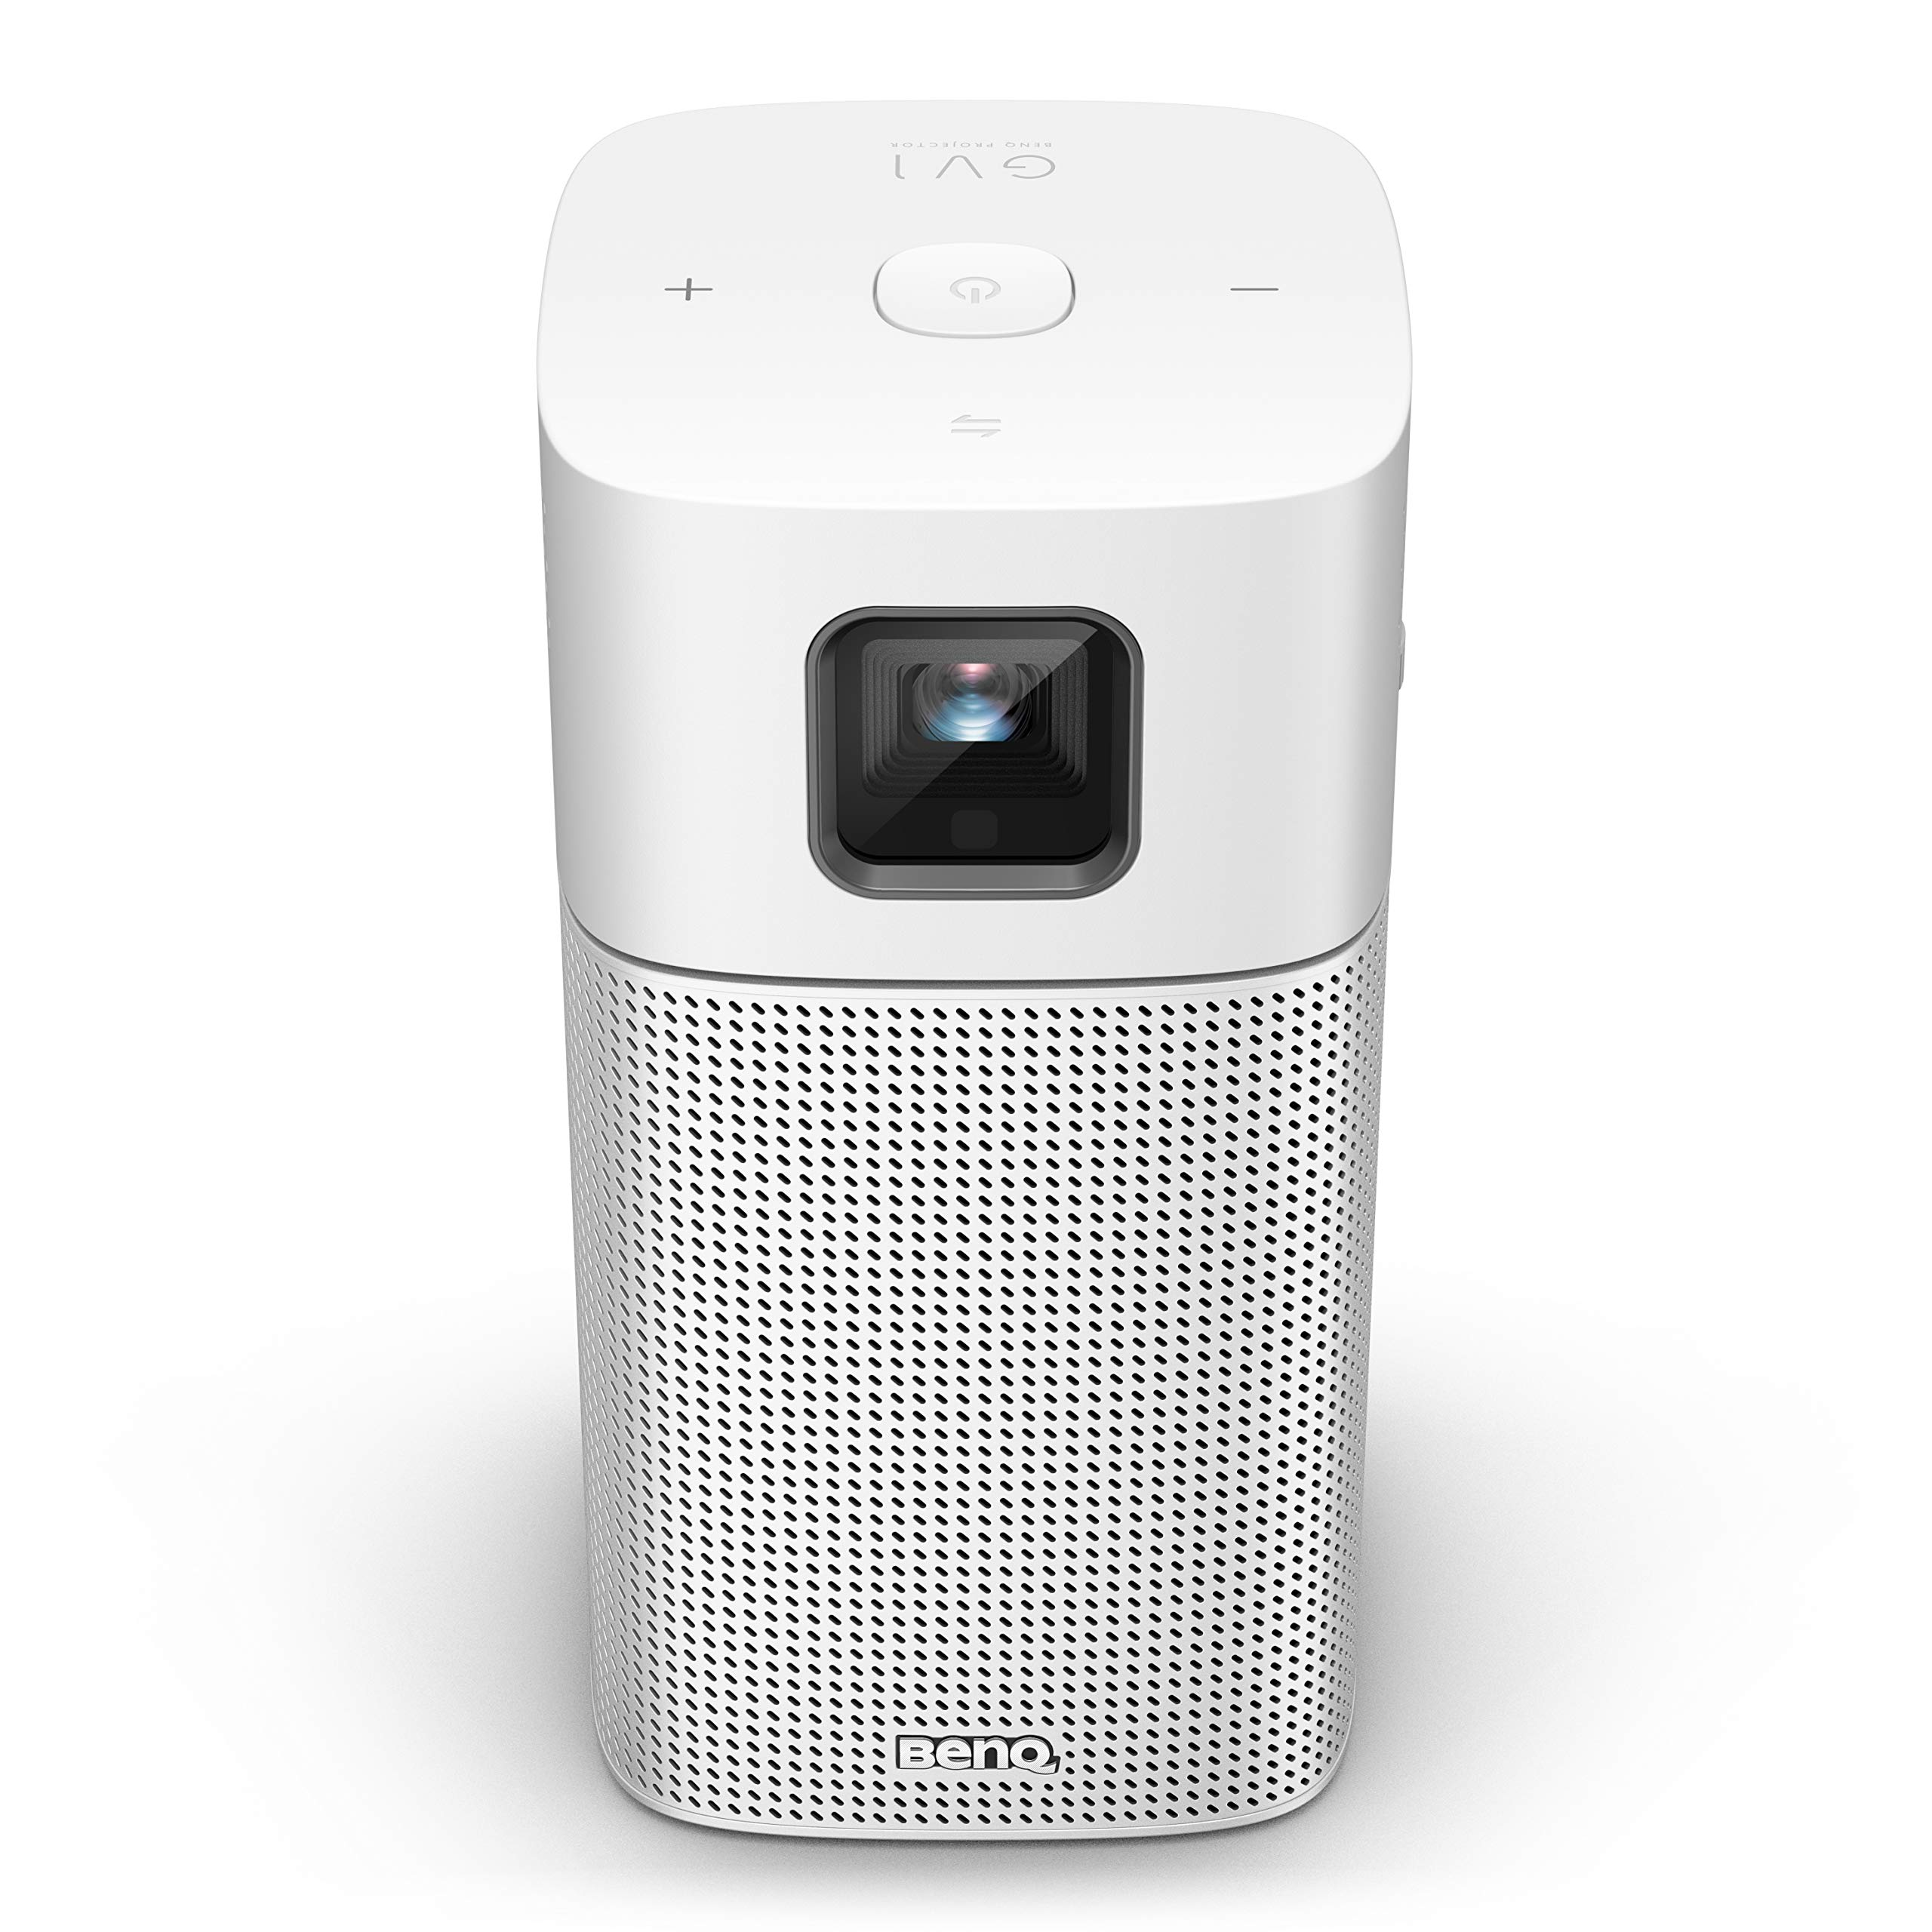 BenQ GV1 Mini Beamer (LED, WVGA, 854 x 480 Pixel, 200 ANSI Lumen, USB C, bluetooth 4.0) silber/grau